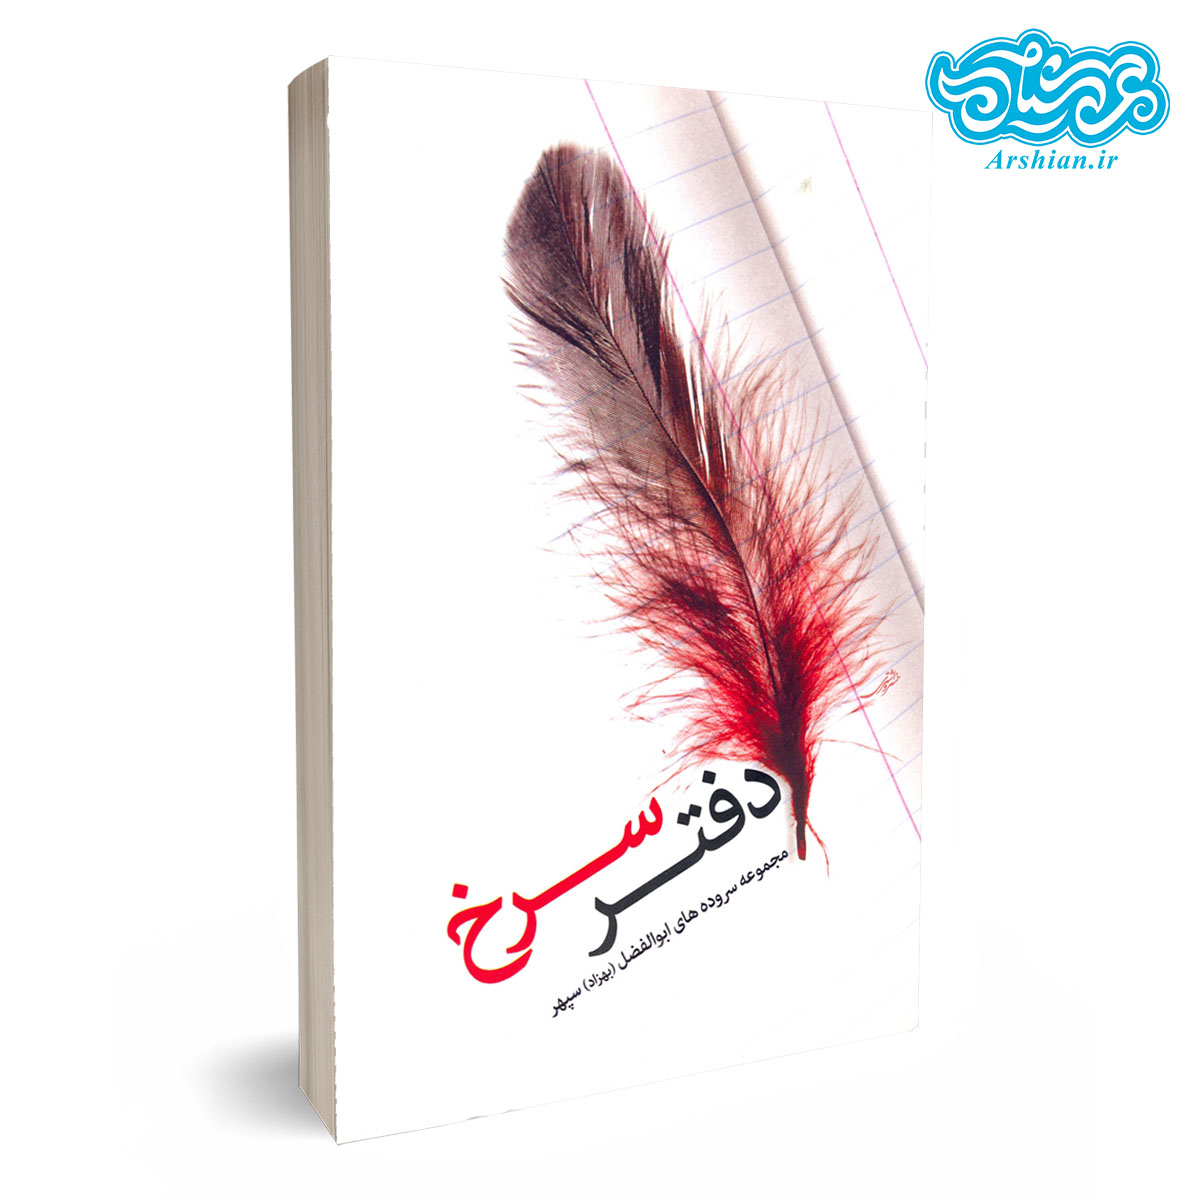 کتاب دفتر سرخ - مجموعه اشعار اباالفضل سپهر